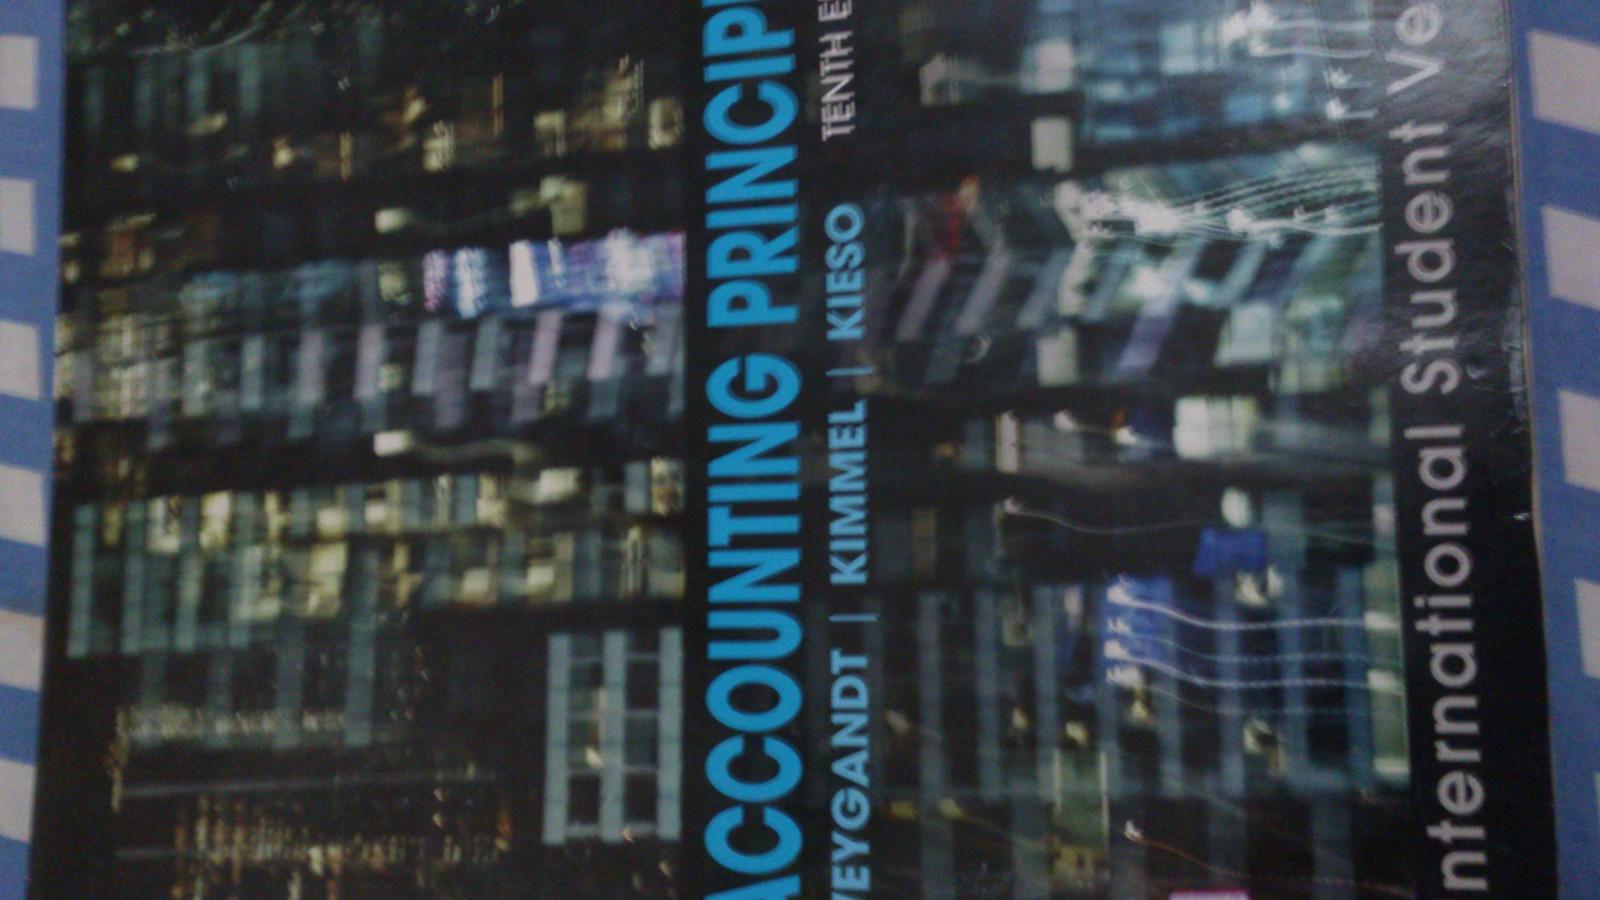 accounting principles 10th edition